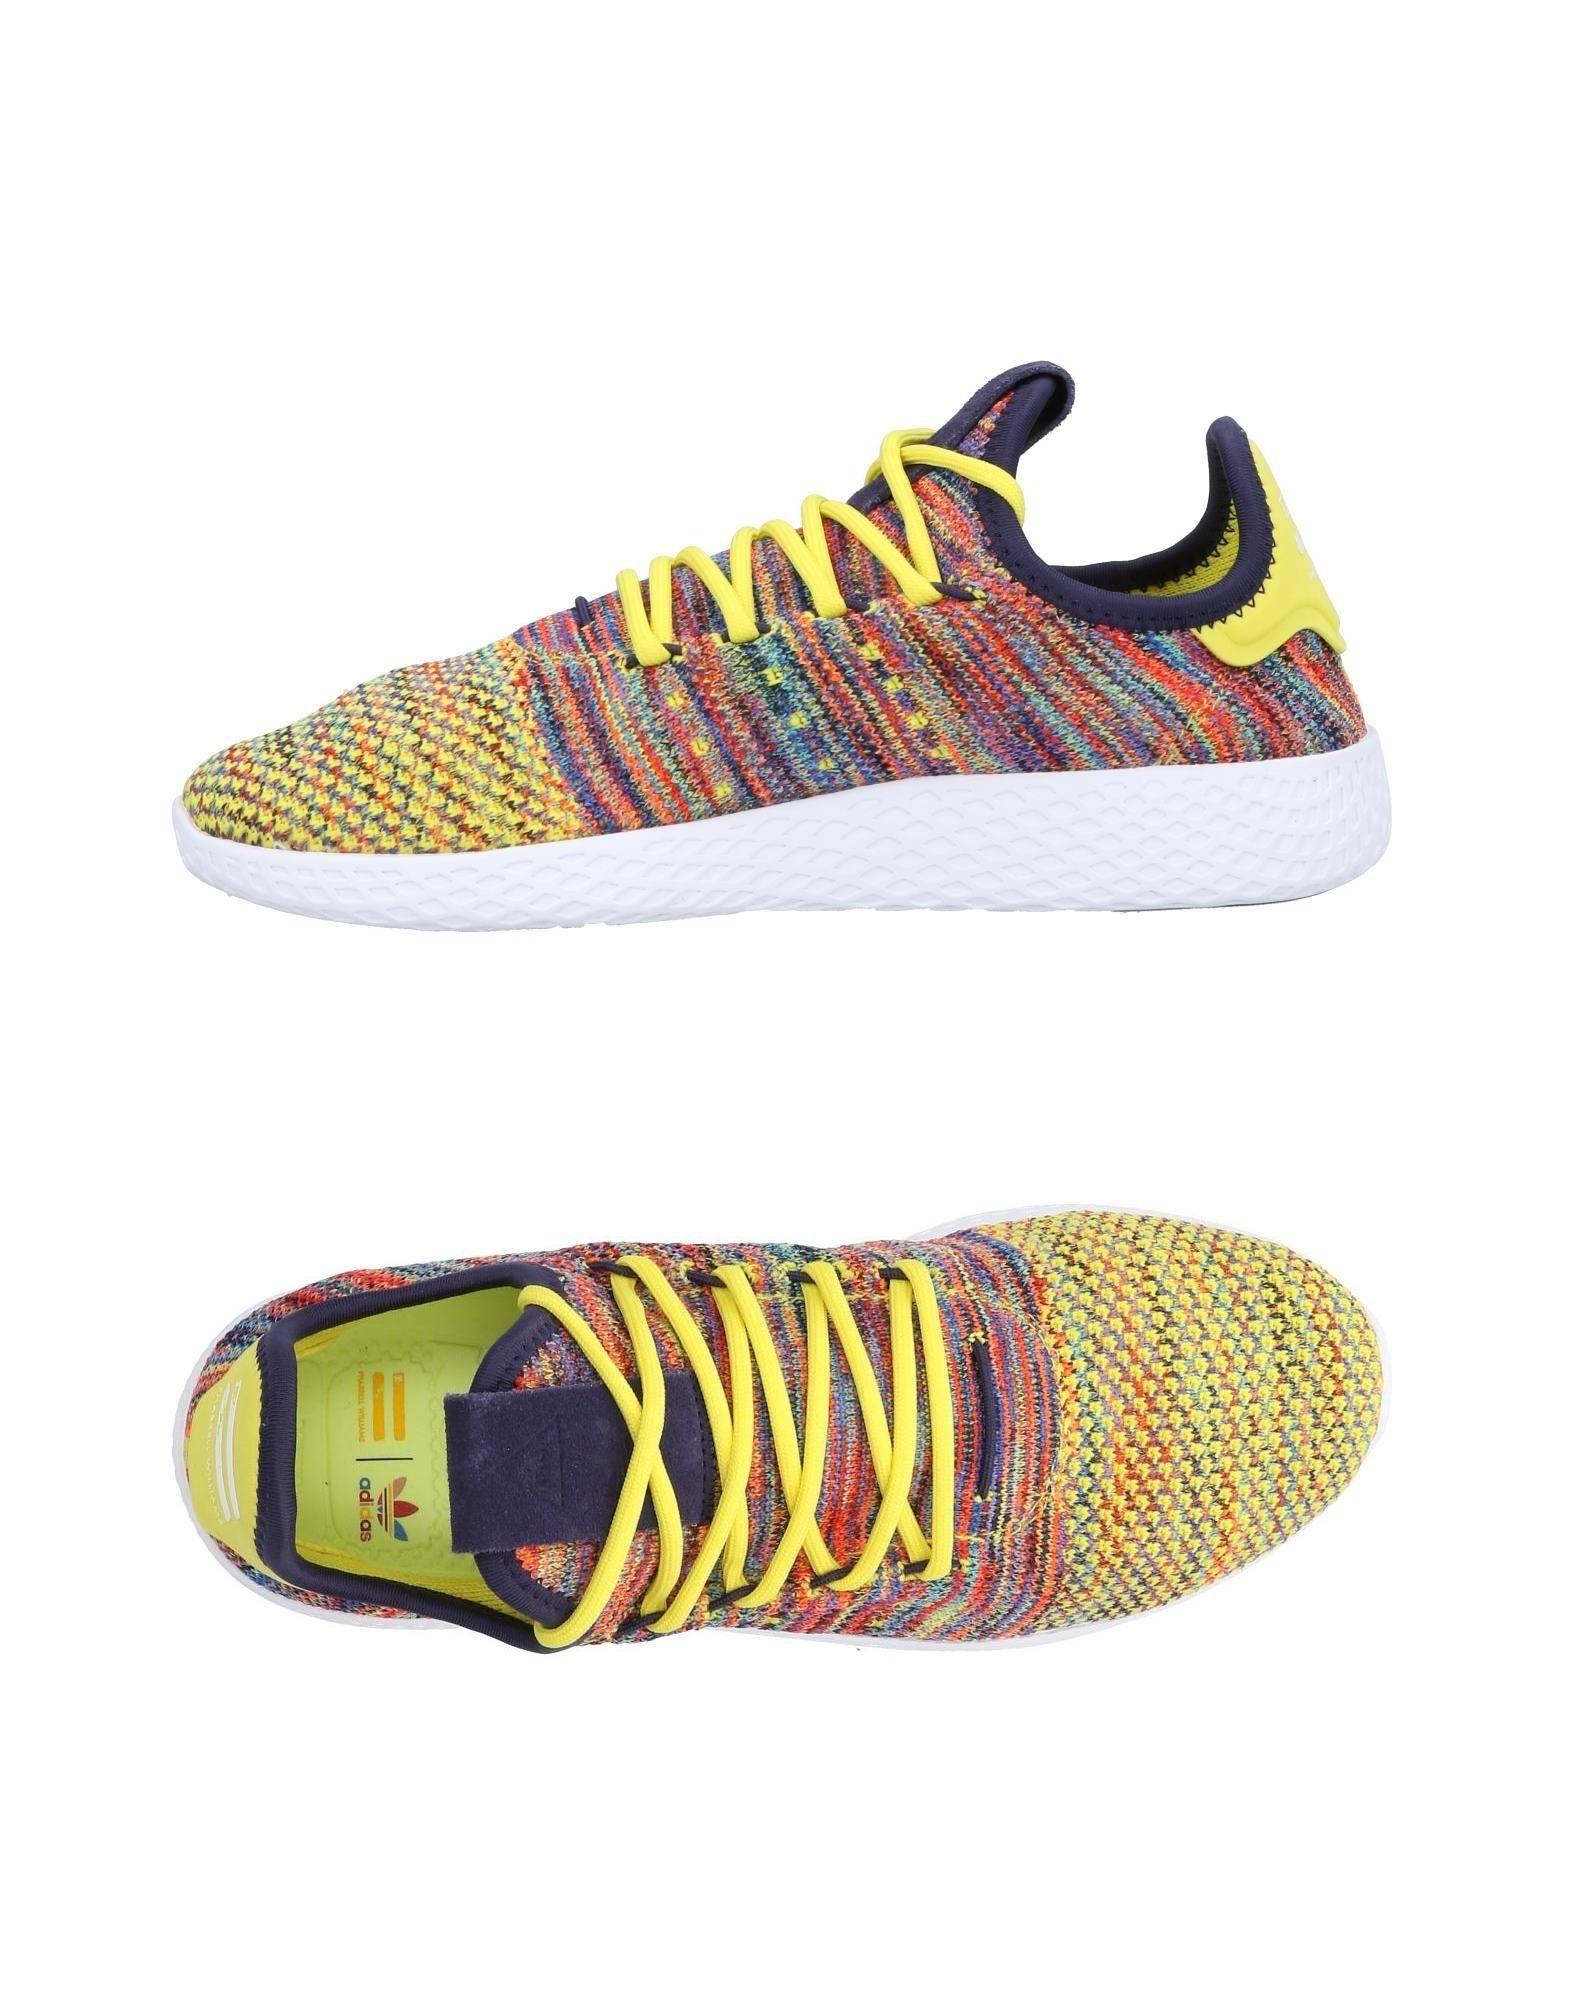 ADIDAS ORIGINALS by PHARRELL WILLIAMS Низкие кеды и кроссовки adidas x pharrell little kids superstar supercolor